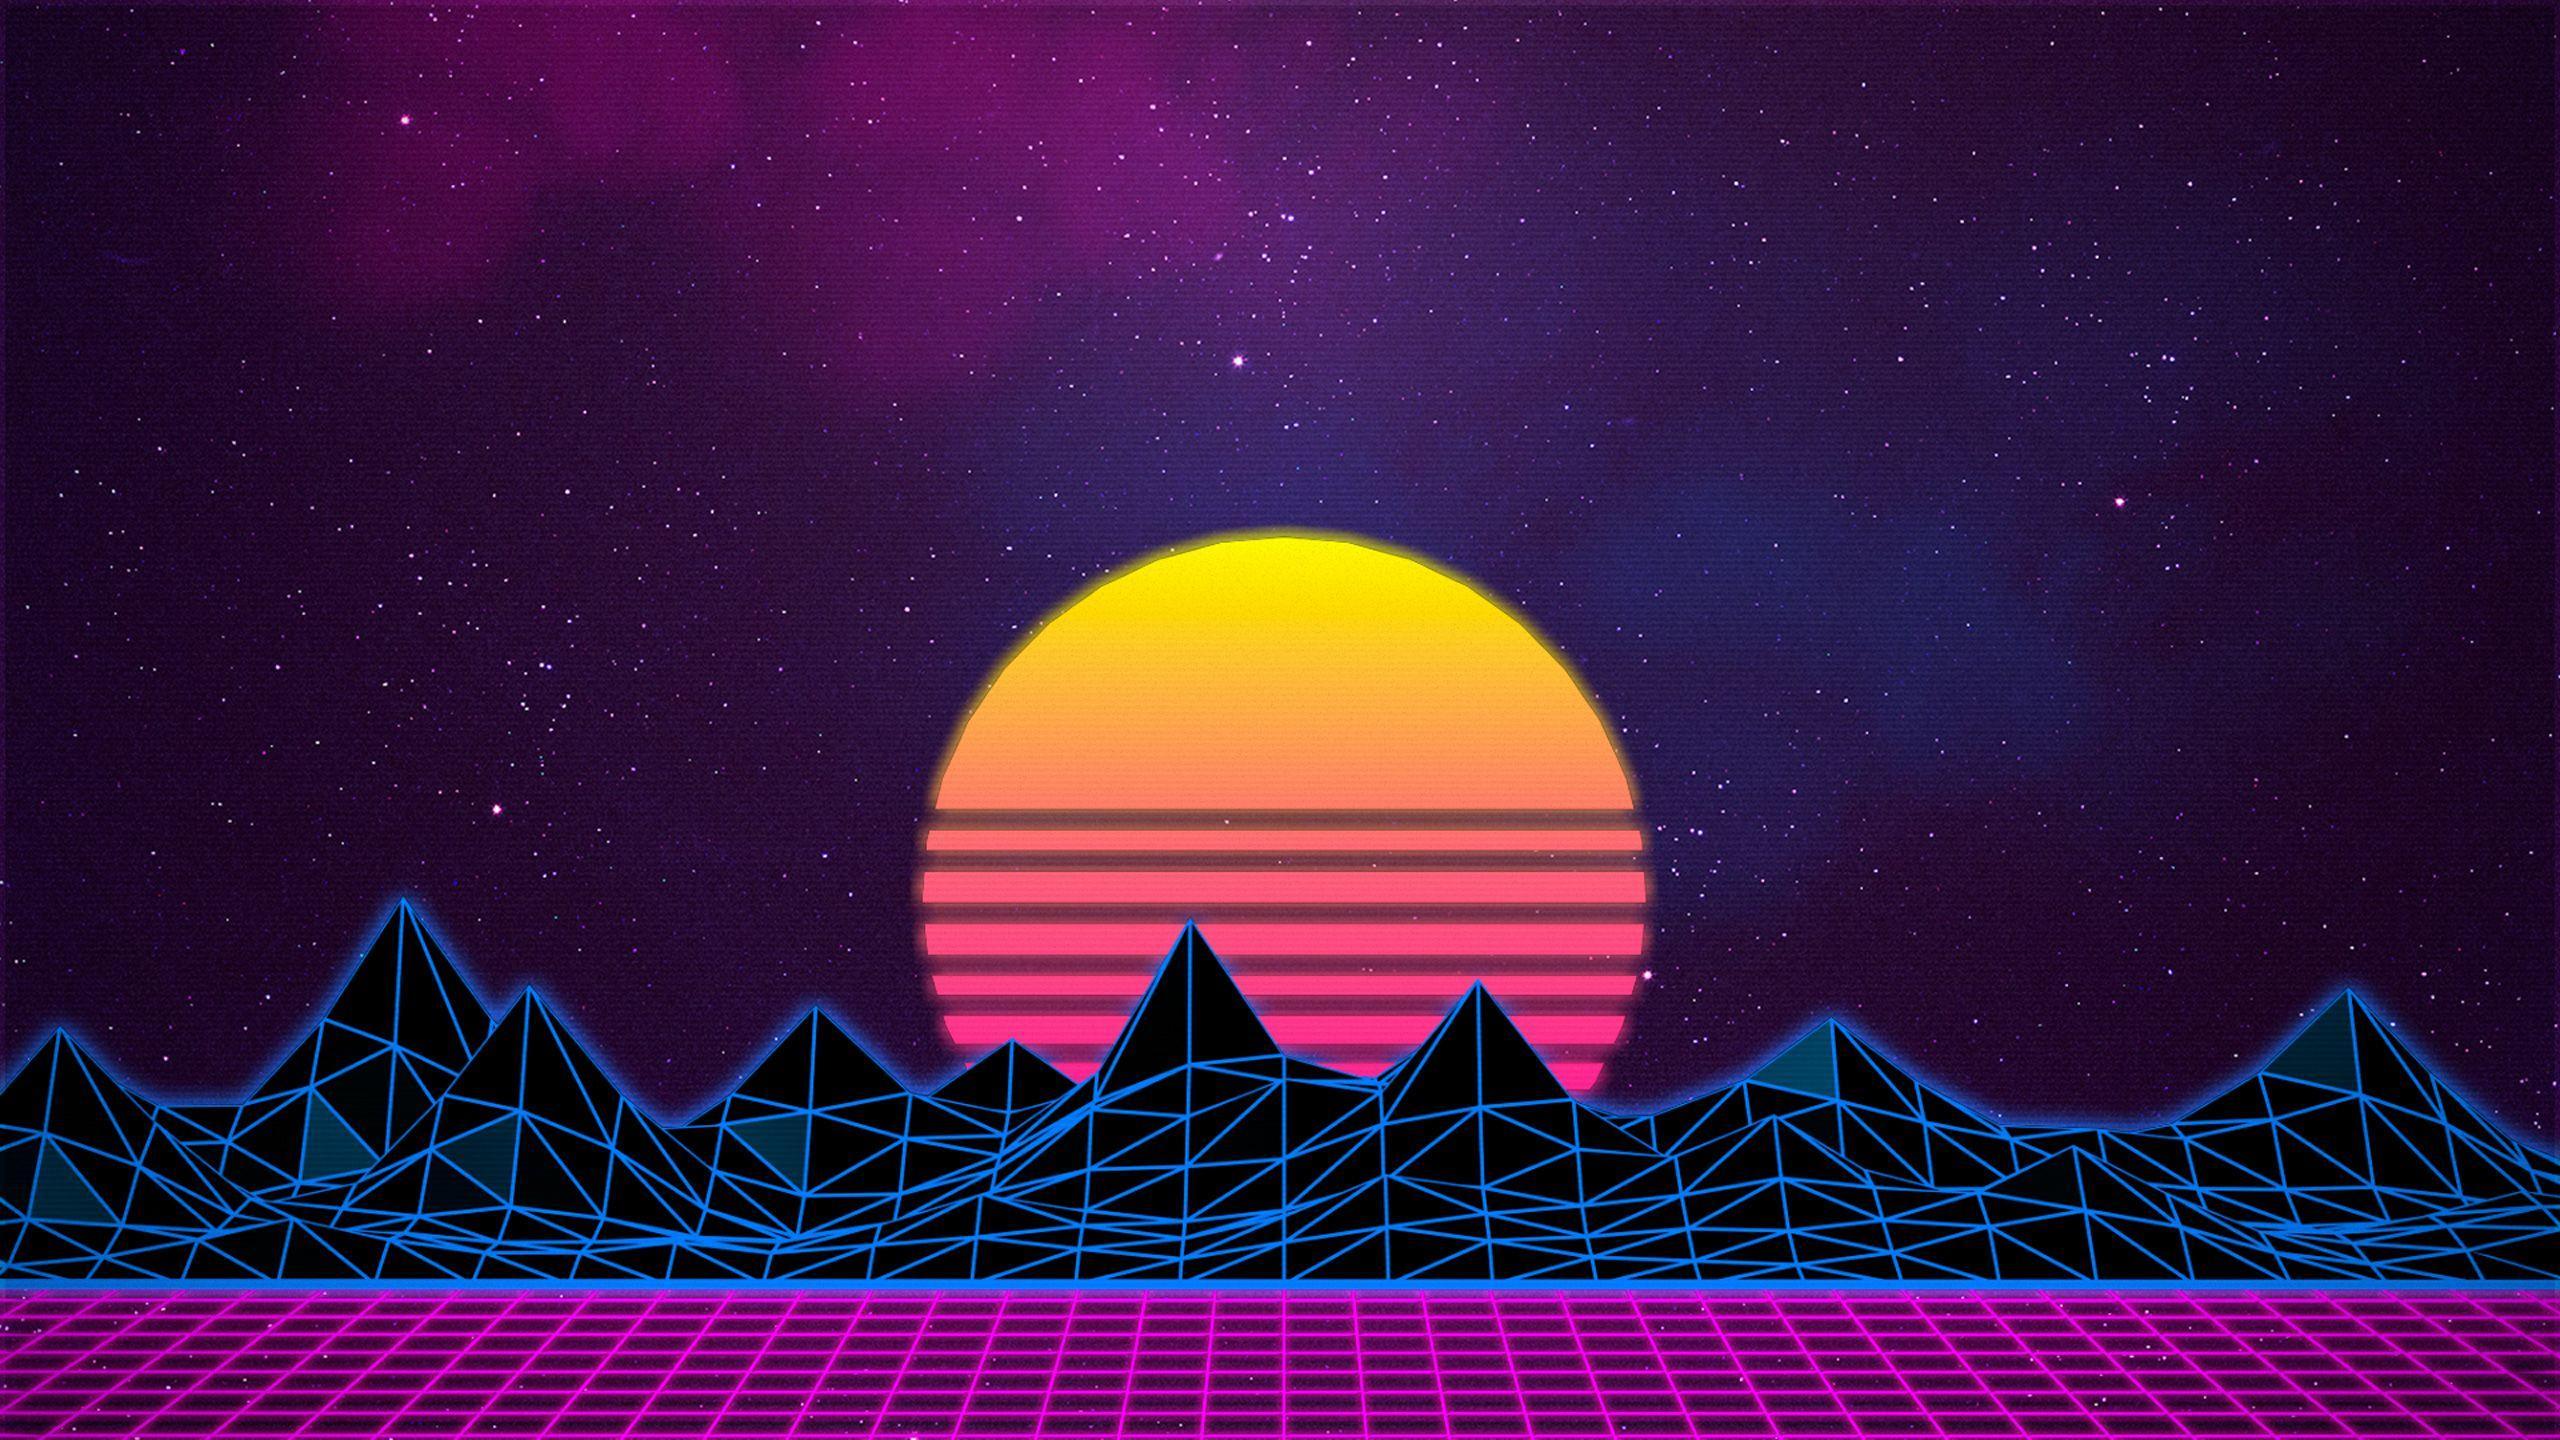 Retro Gaming Sunrise Wallpapers Wallpaper Cave